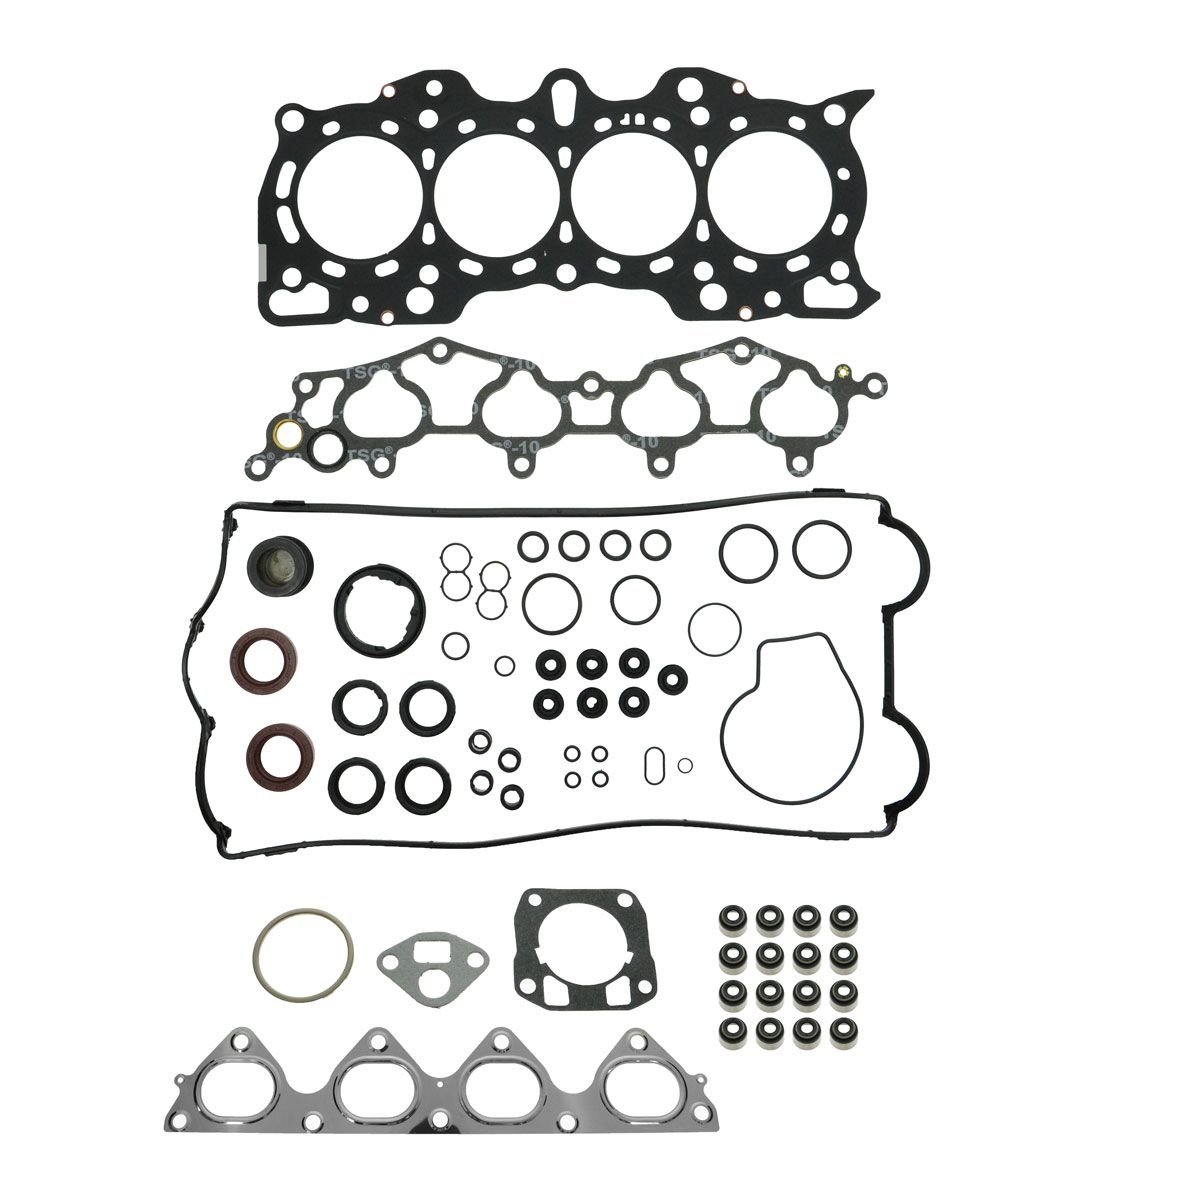 Engine Head Gasket Kit Set NEW For 90-01 Acura Integra 1